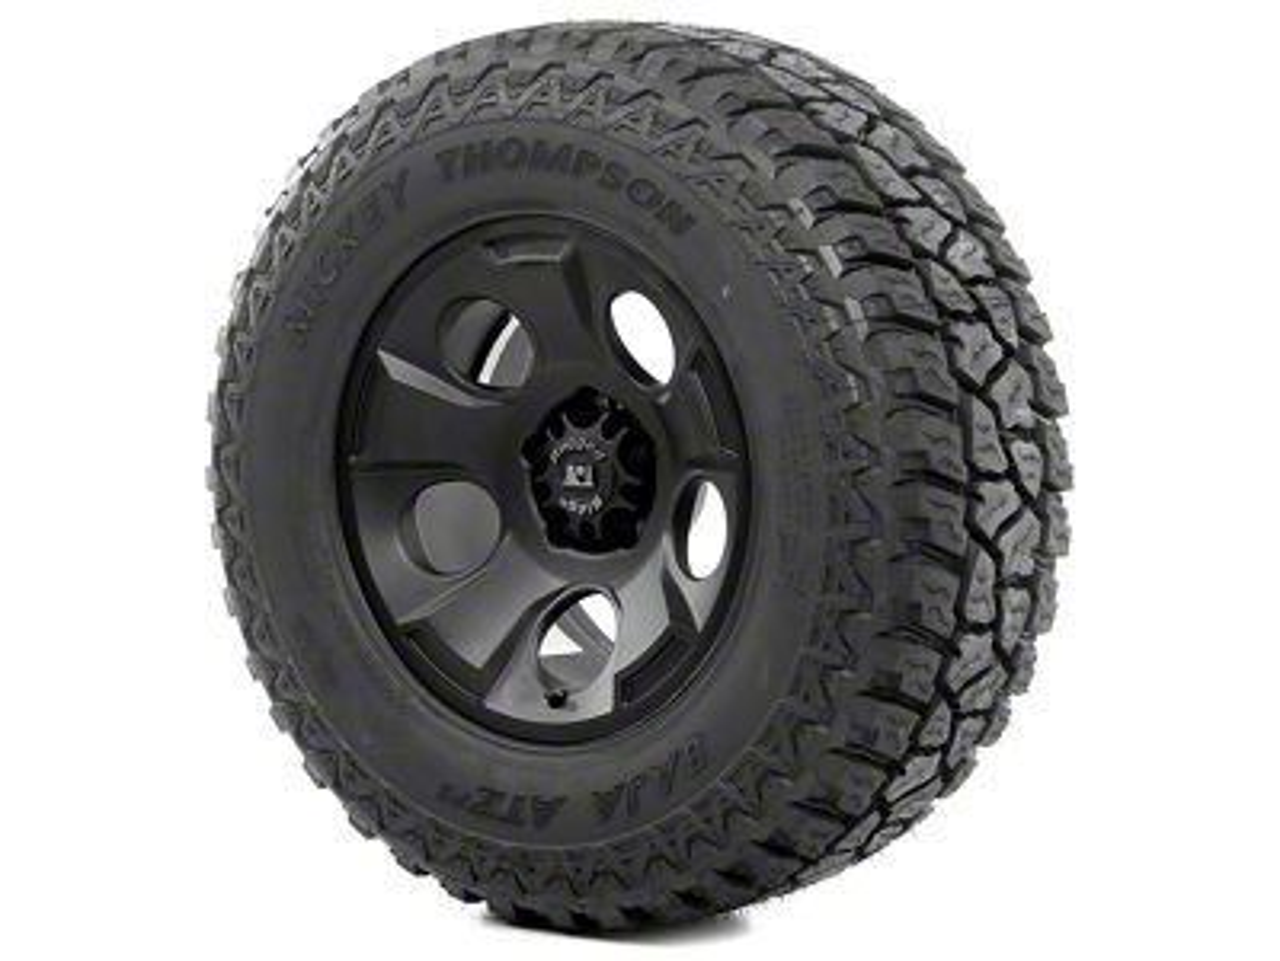 Rugged Ridge Drakon Wheel 17x9 Black Satin and Mickey Thompson ATZ P3 315/70R17 Tire Kit (07-18 Jeep Wrangler JK)